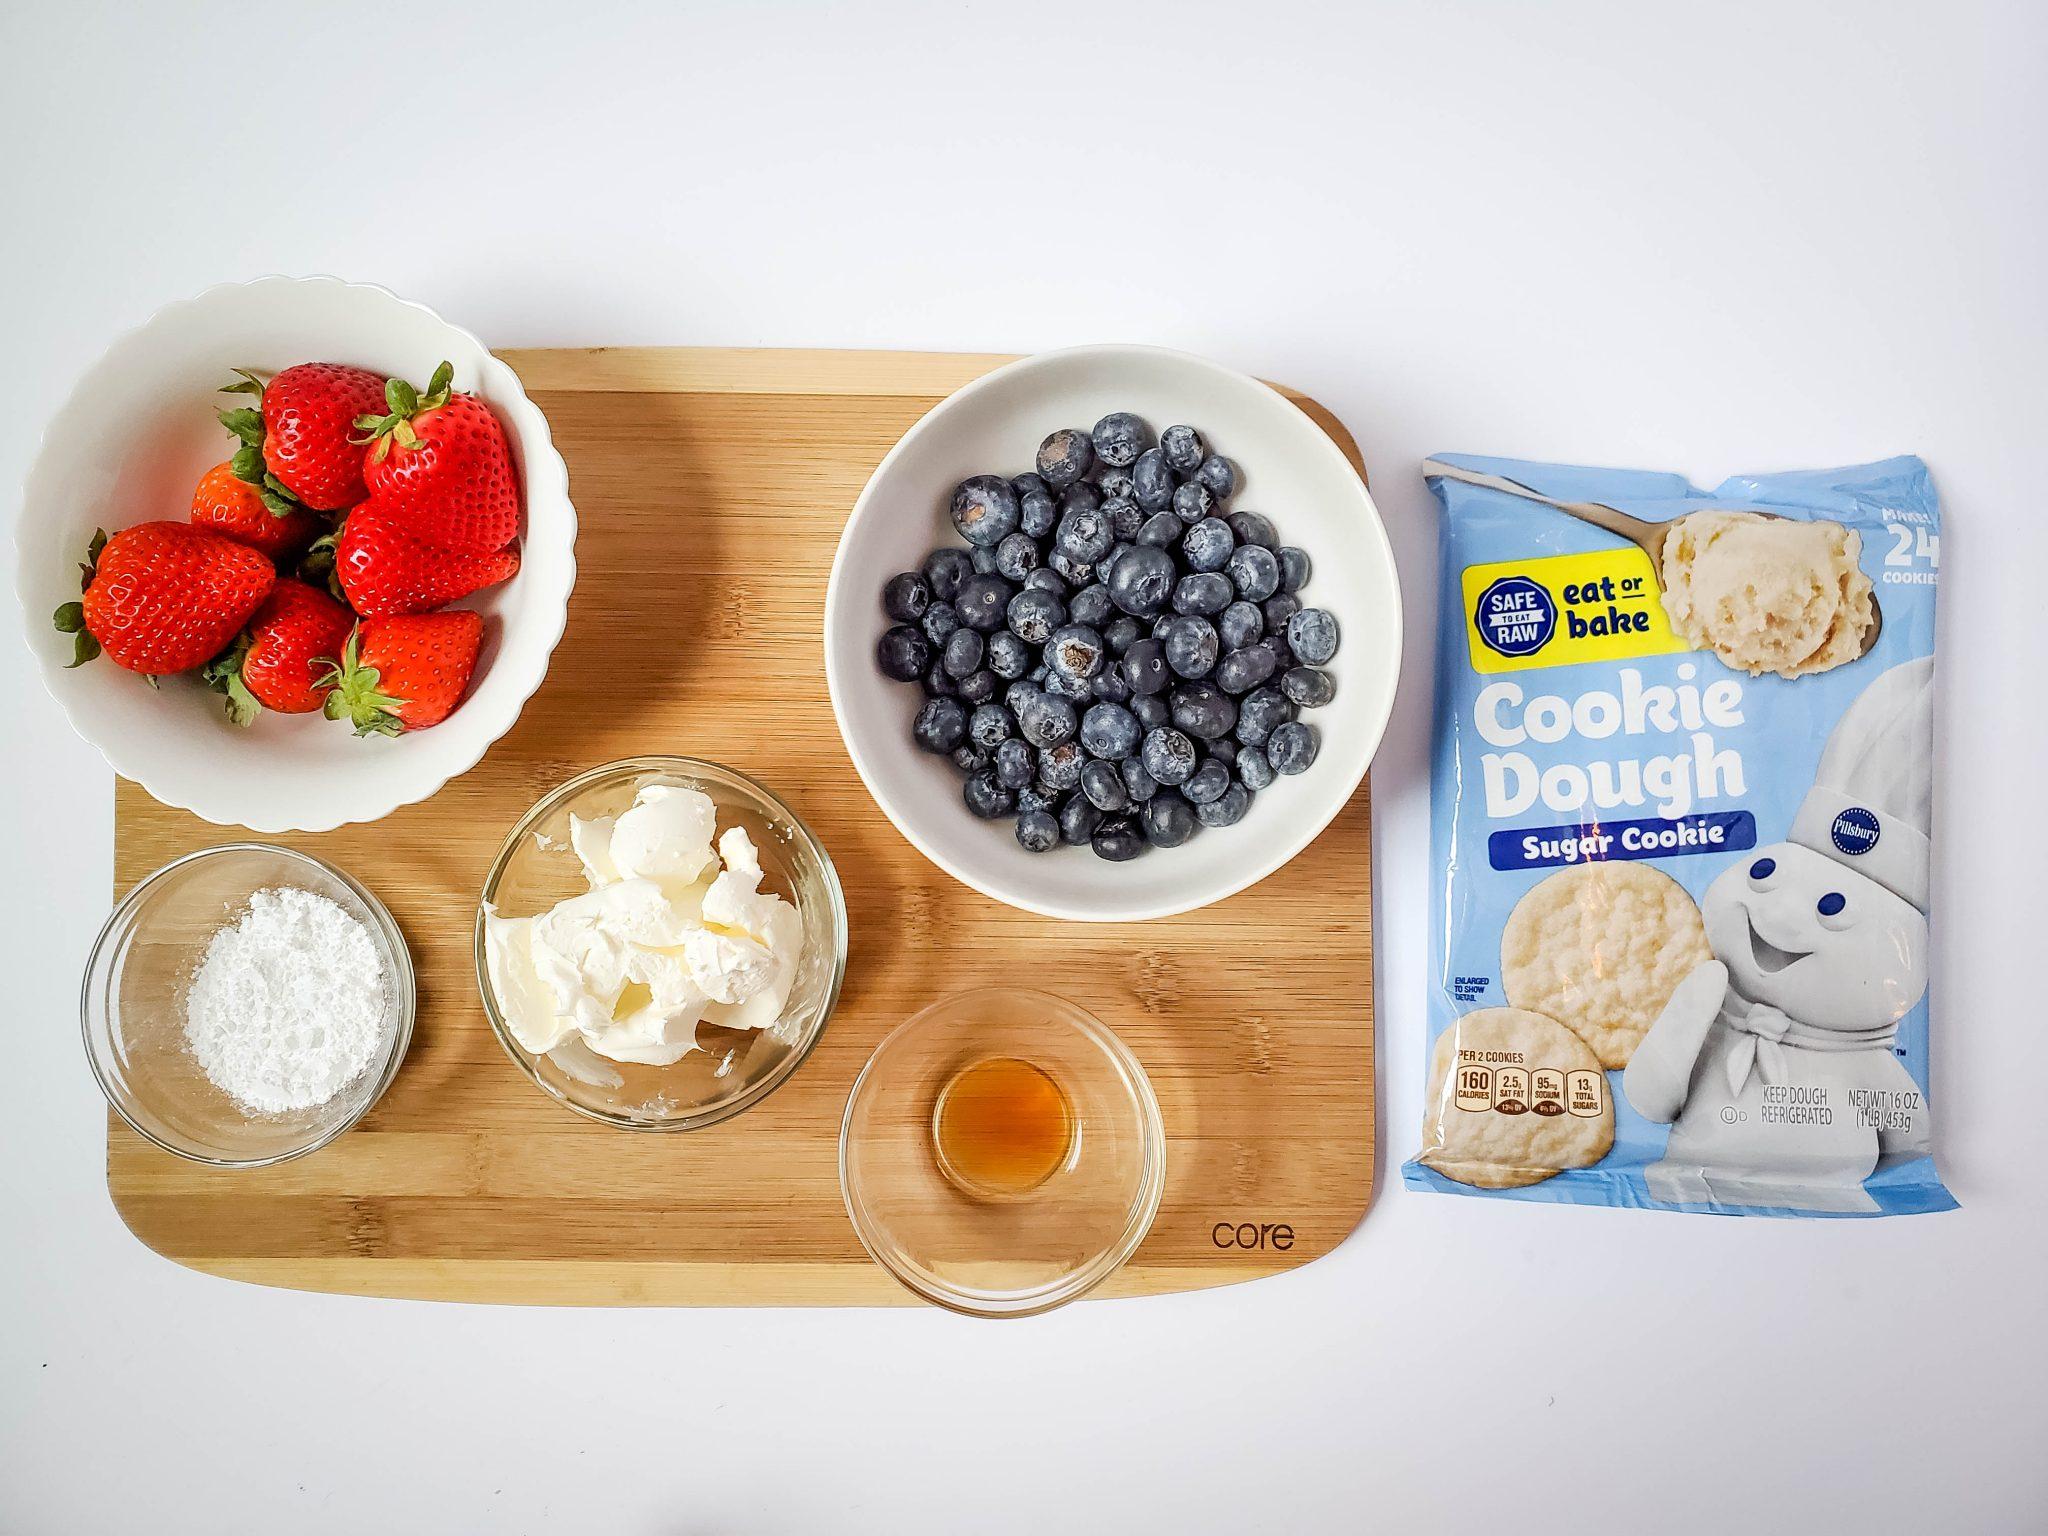 Pillsbury sugar cookie packaged dough, blueberries in a white bowl, strawberries in a white bowl, and clear glass bowls of powdered sugar, cream cheese, and vanilla